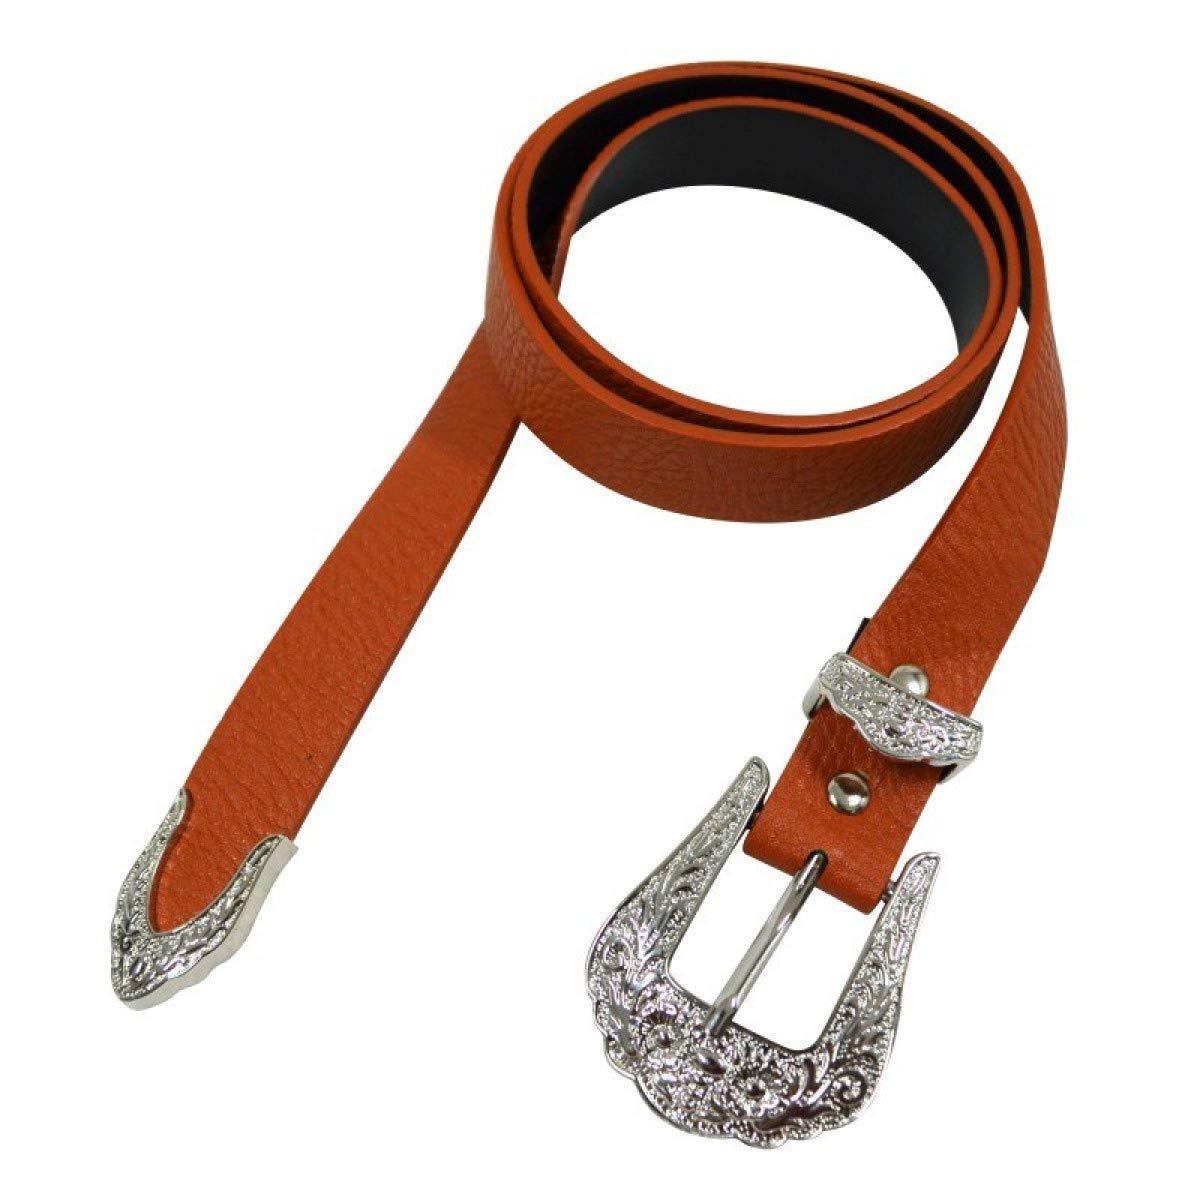 e24148947 Amazon.com: HOMES1 Pin Buckle Women's Belts Fashion Leather Brand Strap  Vintage Female Waistband Jeans Ceinture Femme riem kemer gg Belt Black:  Home & ...